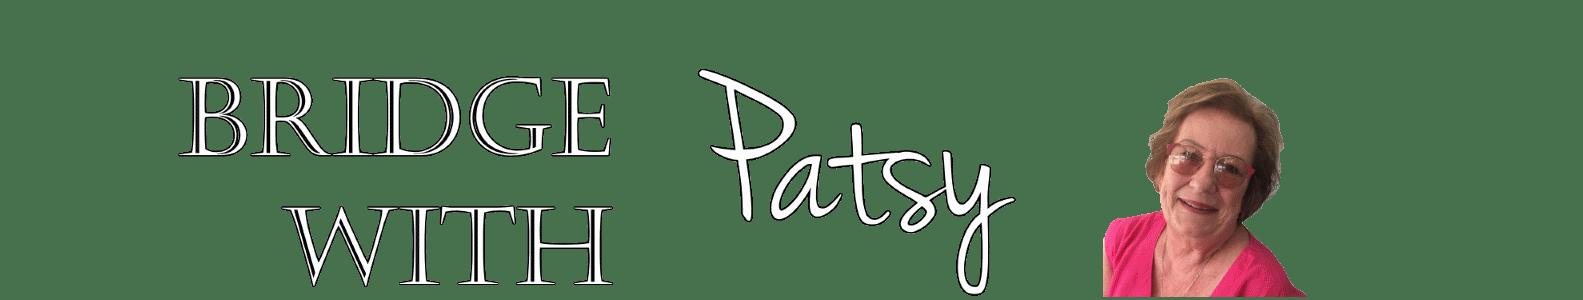 Social bridge with Patsy